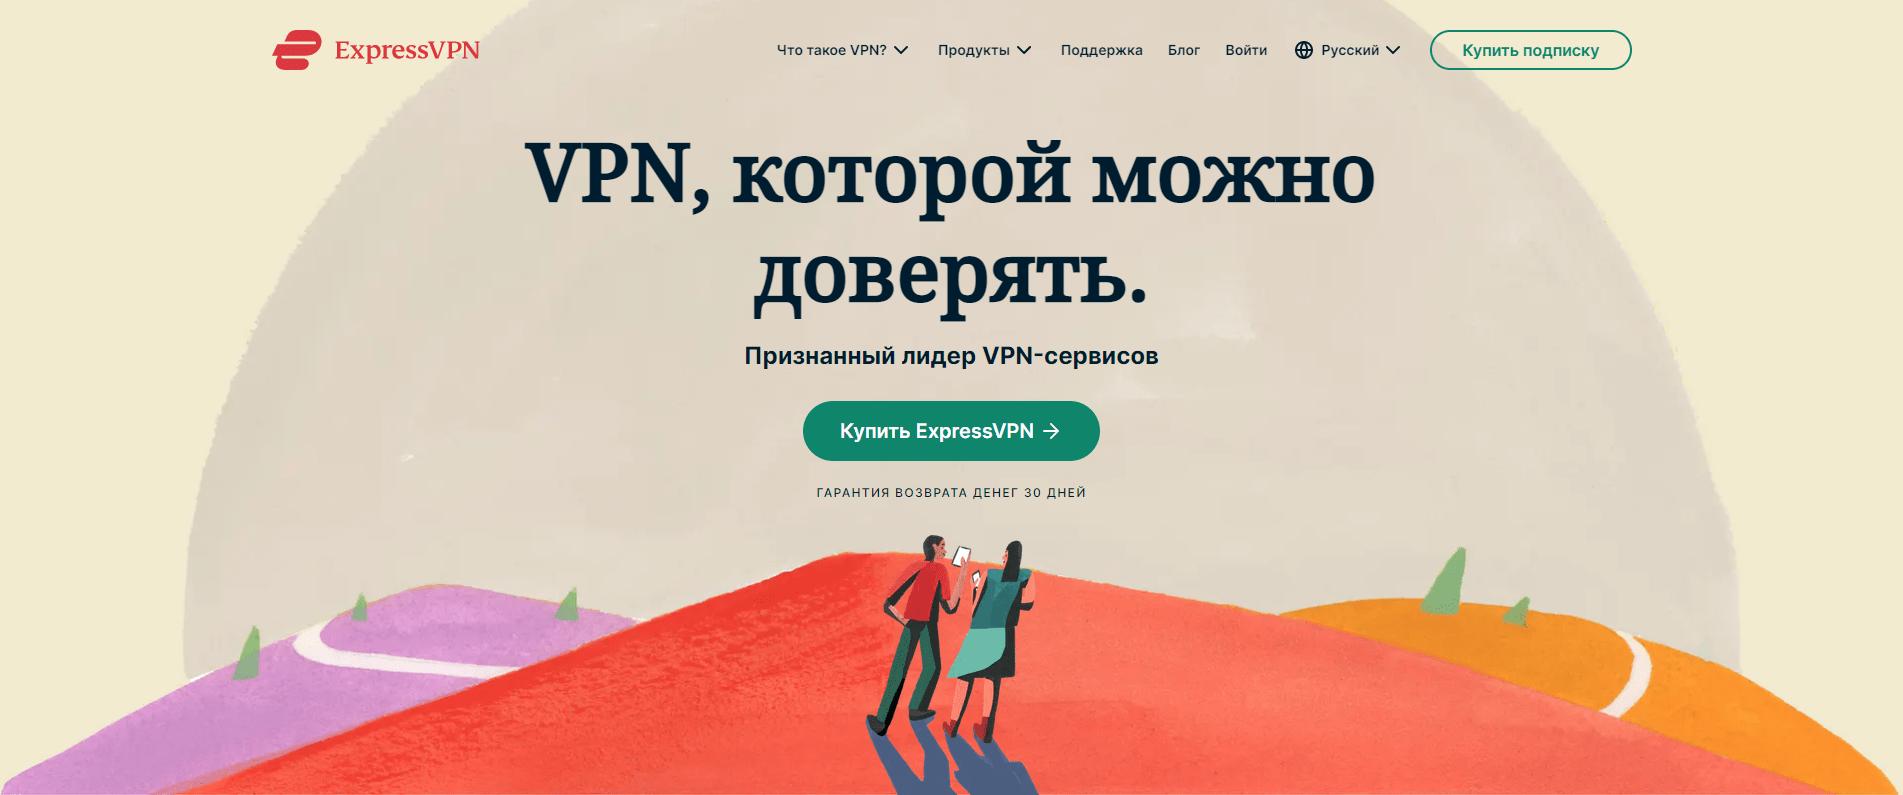 ExpressVPN обзор